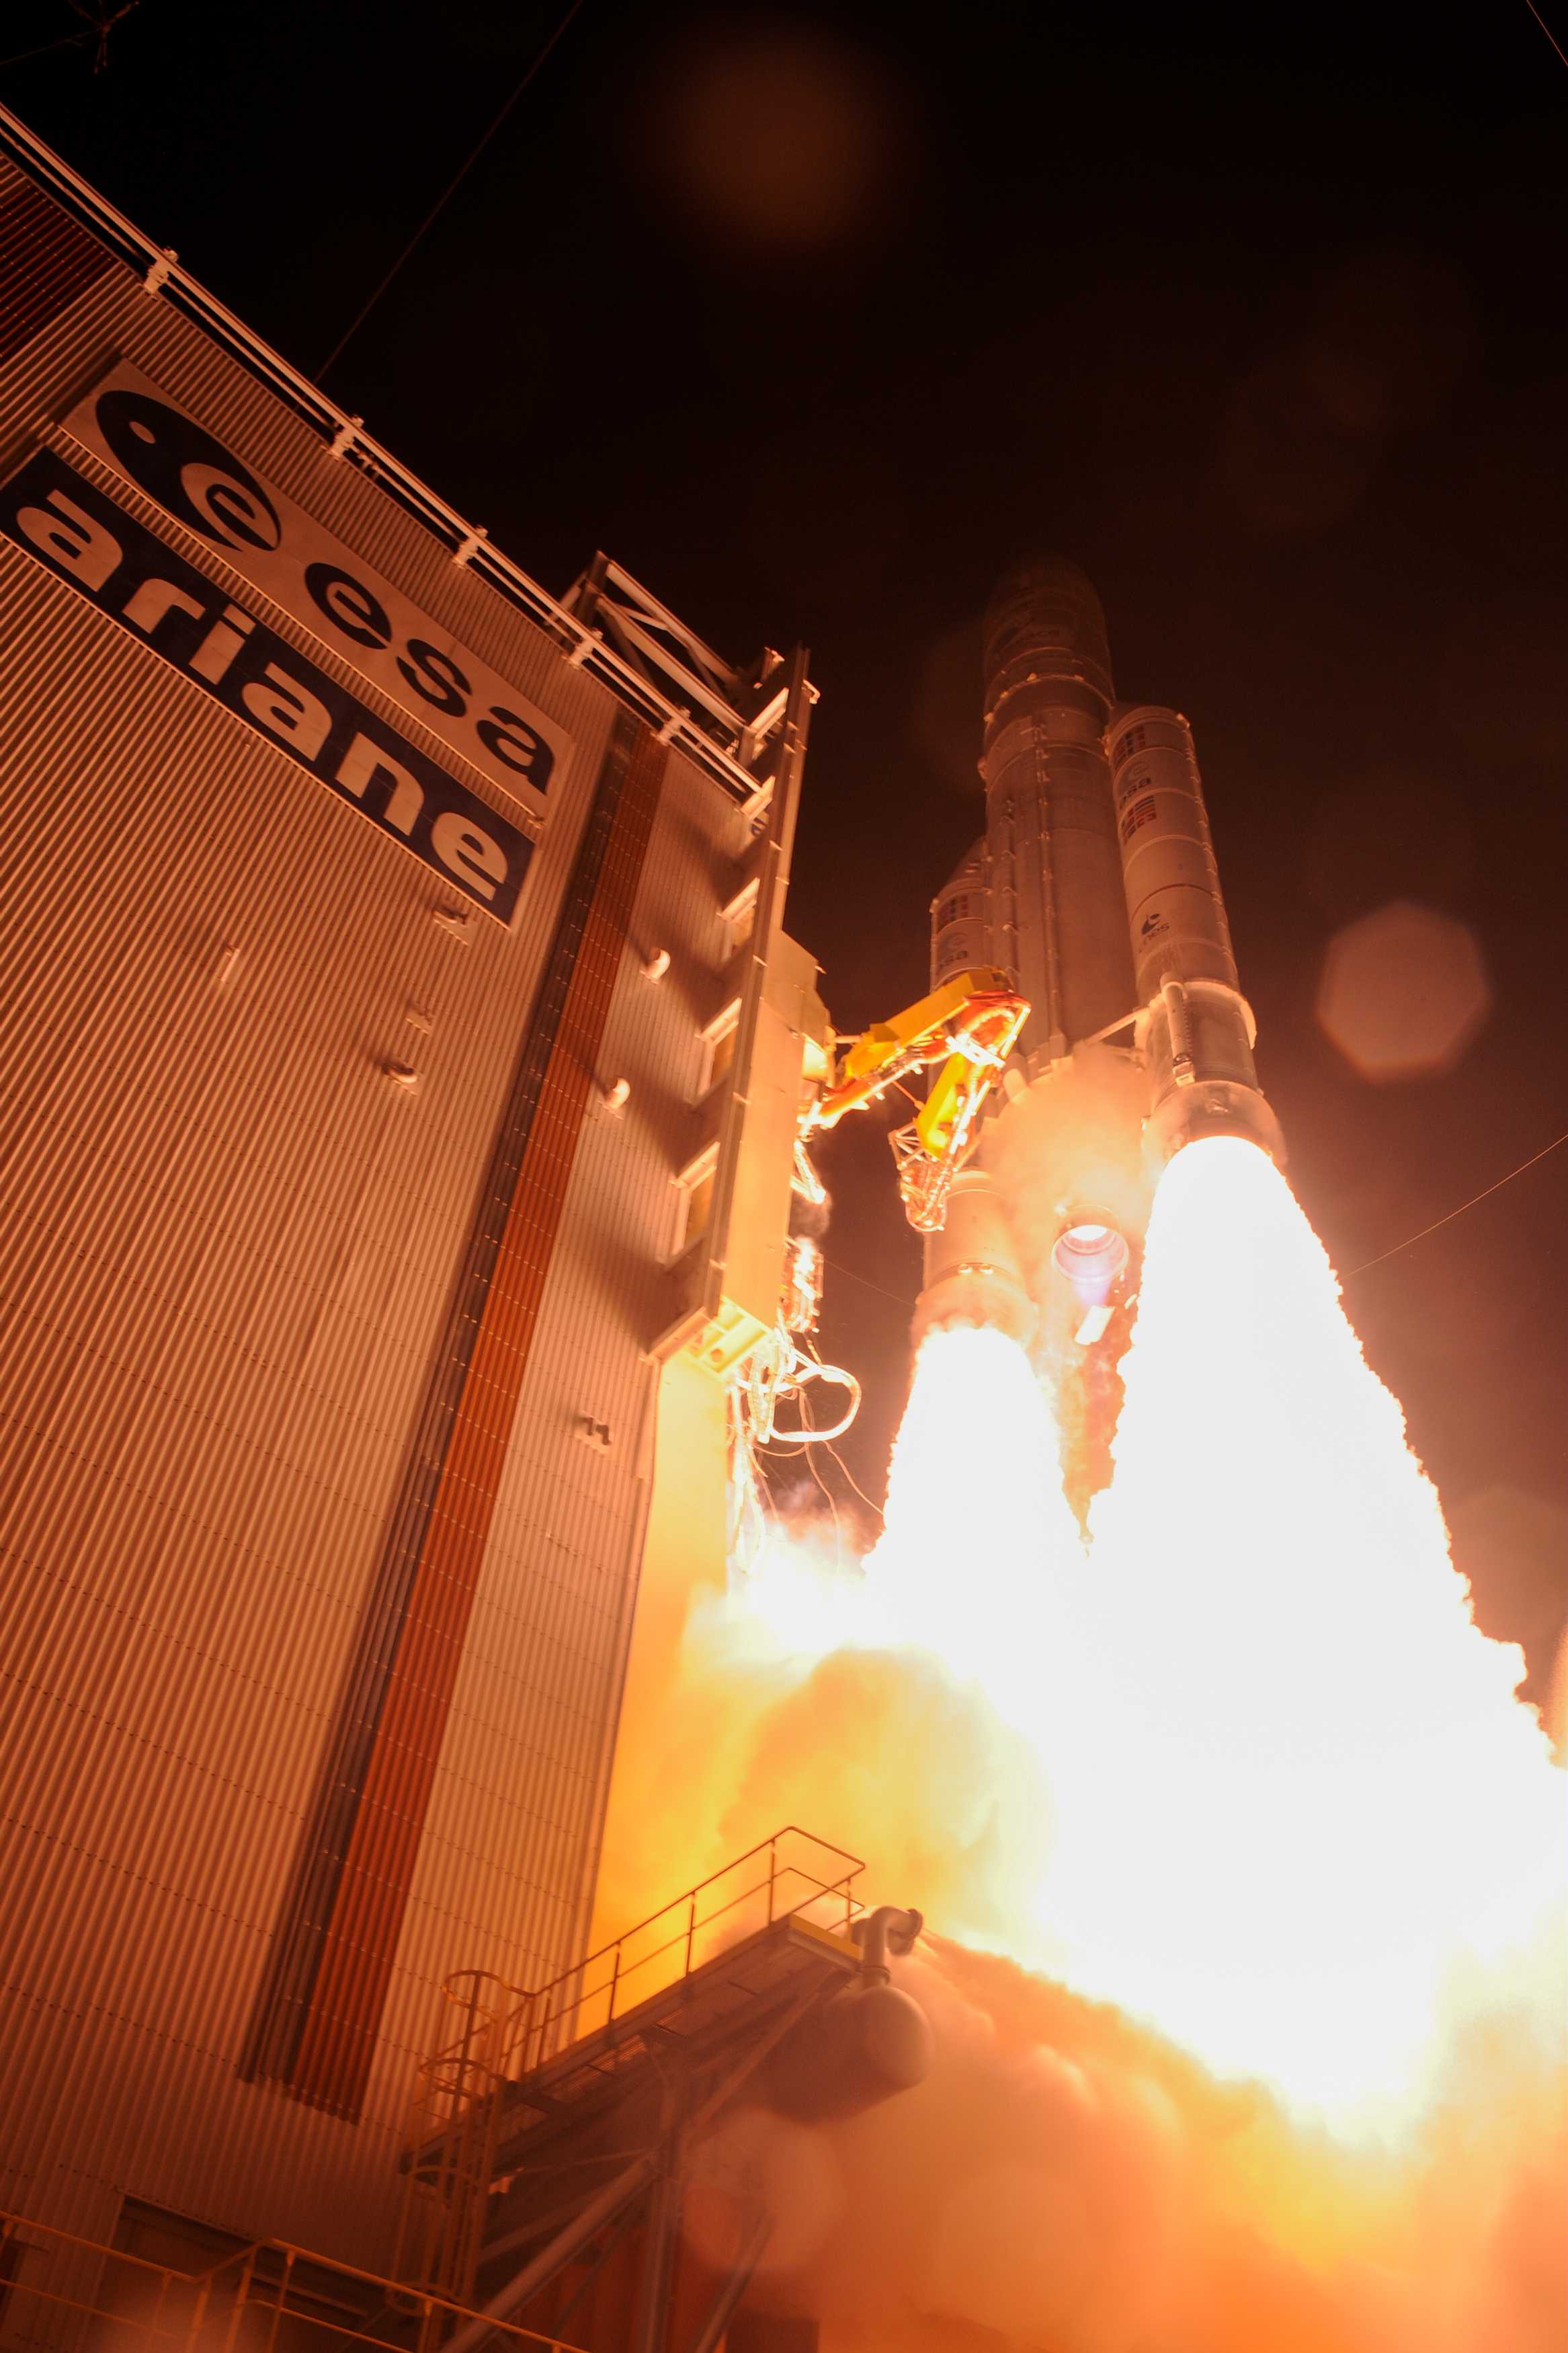 Lancement Ariane 5 (BepiColombo)